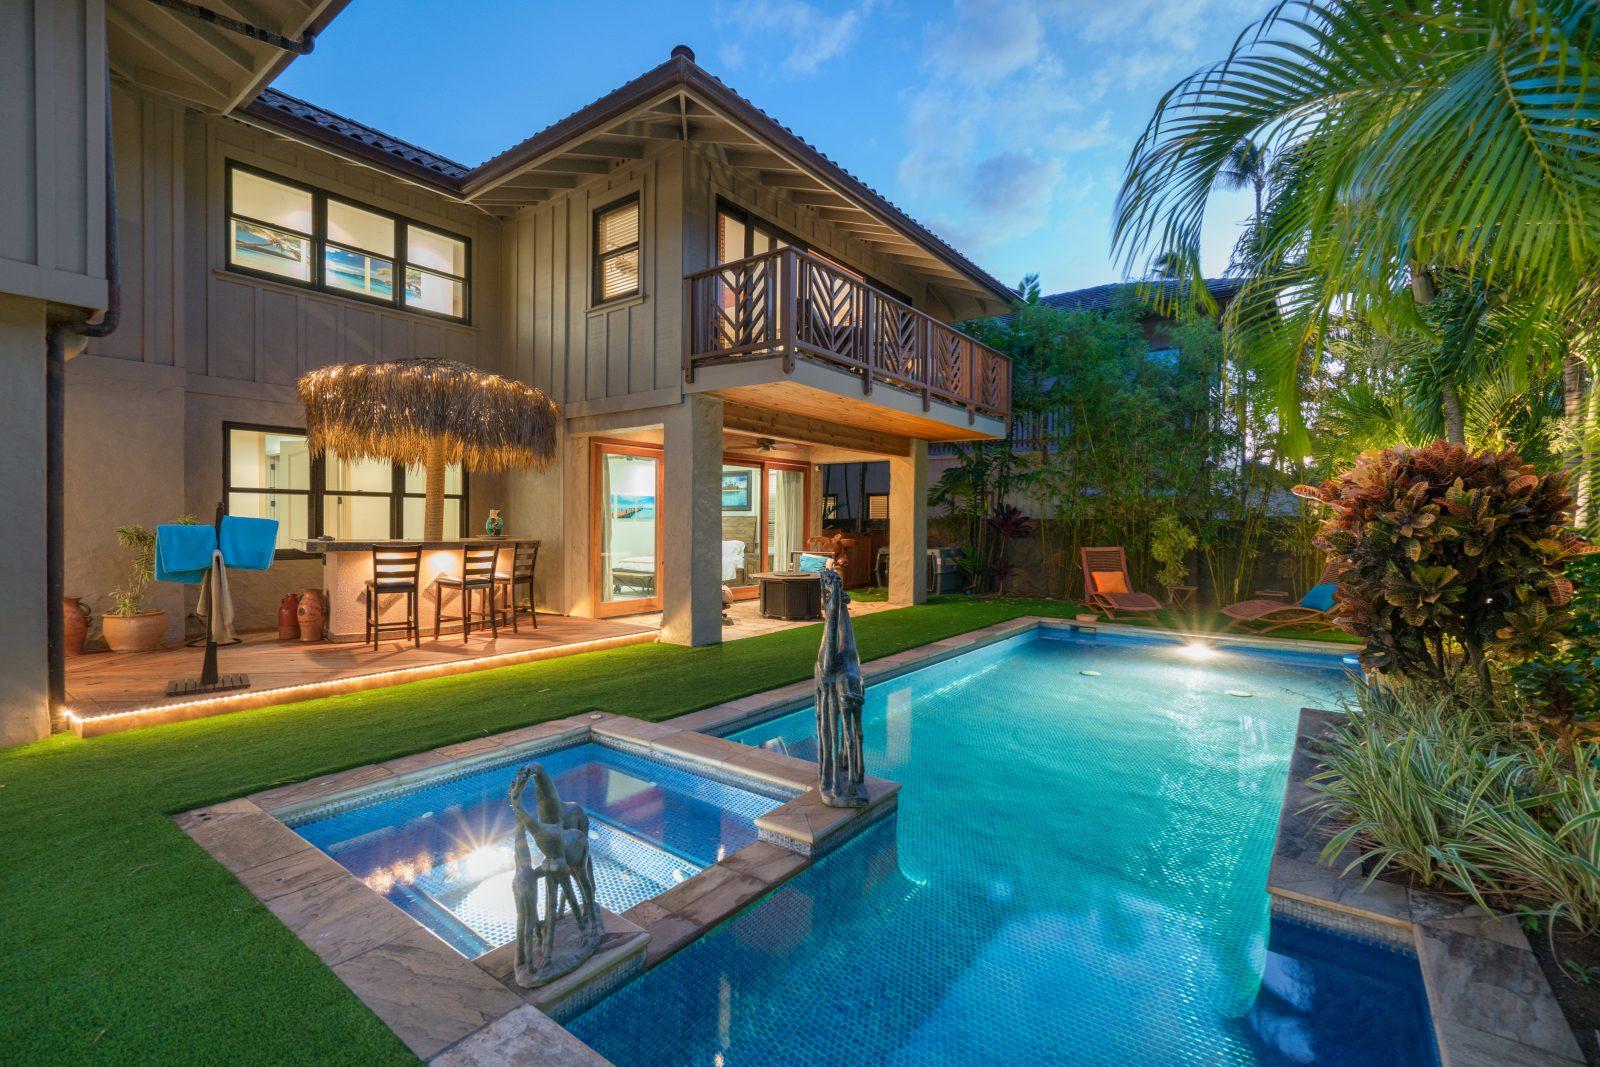 pool house in portlock honolulu hawaii